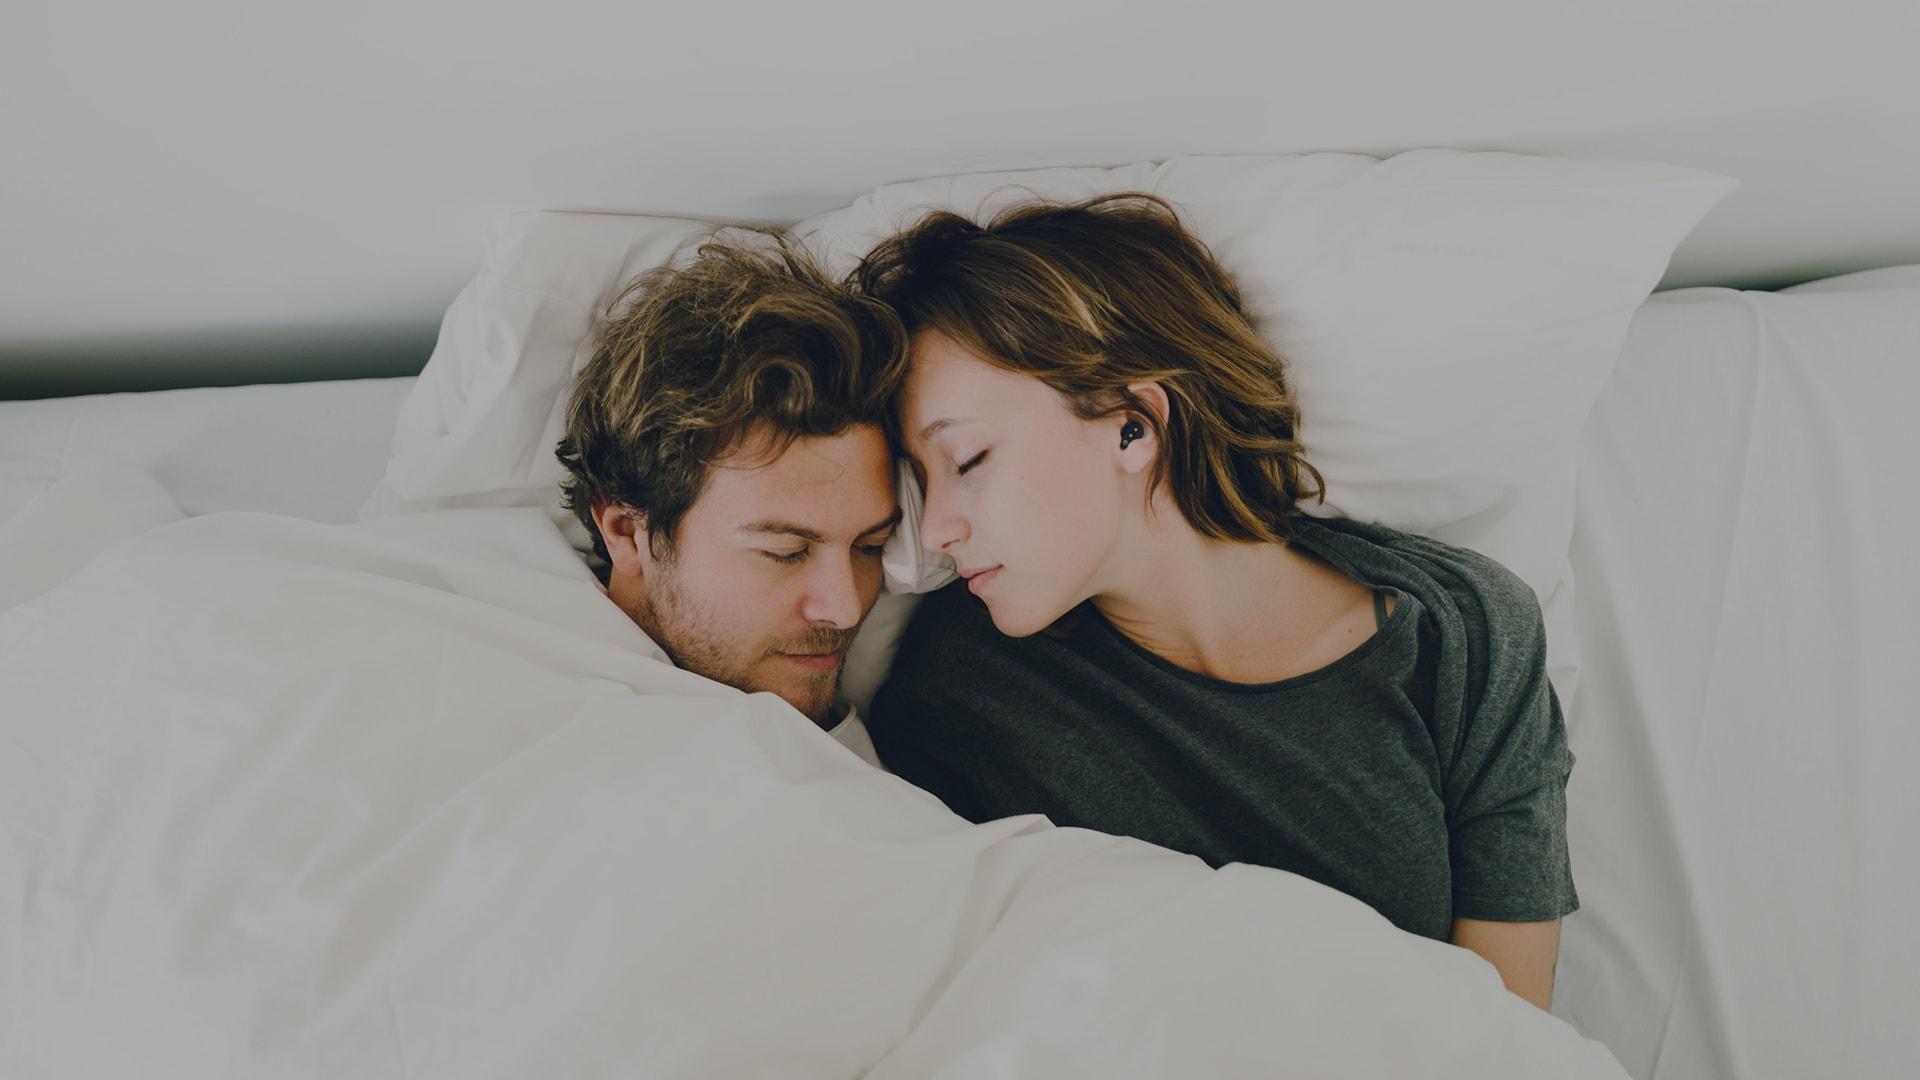 earbuds for sleeping help you sleep better